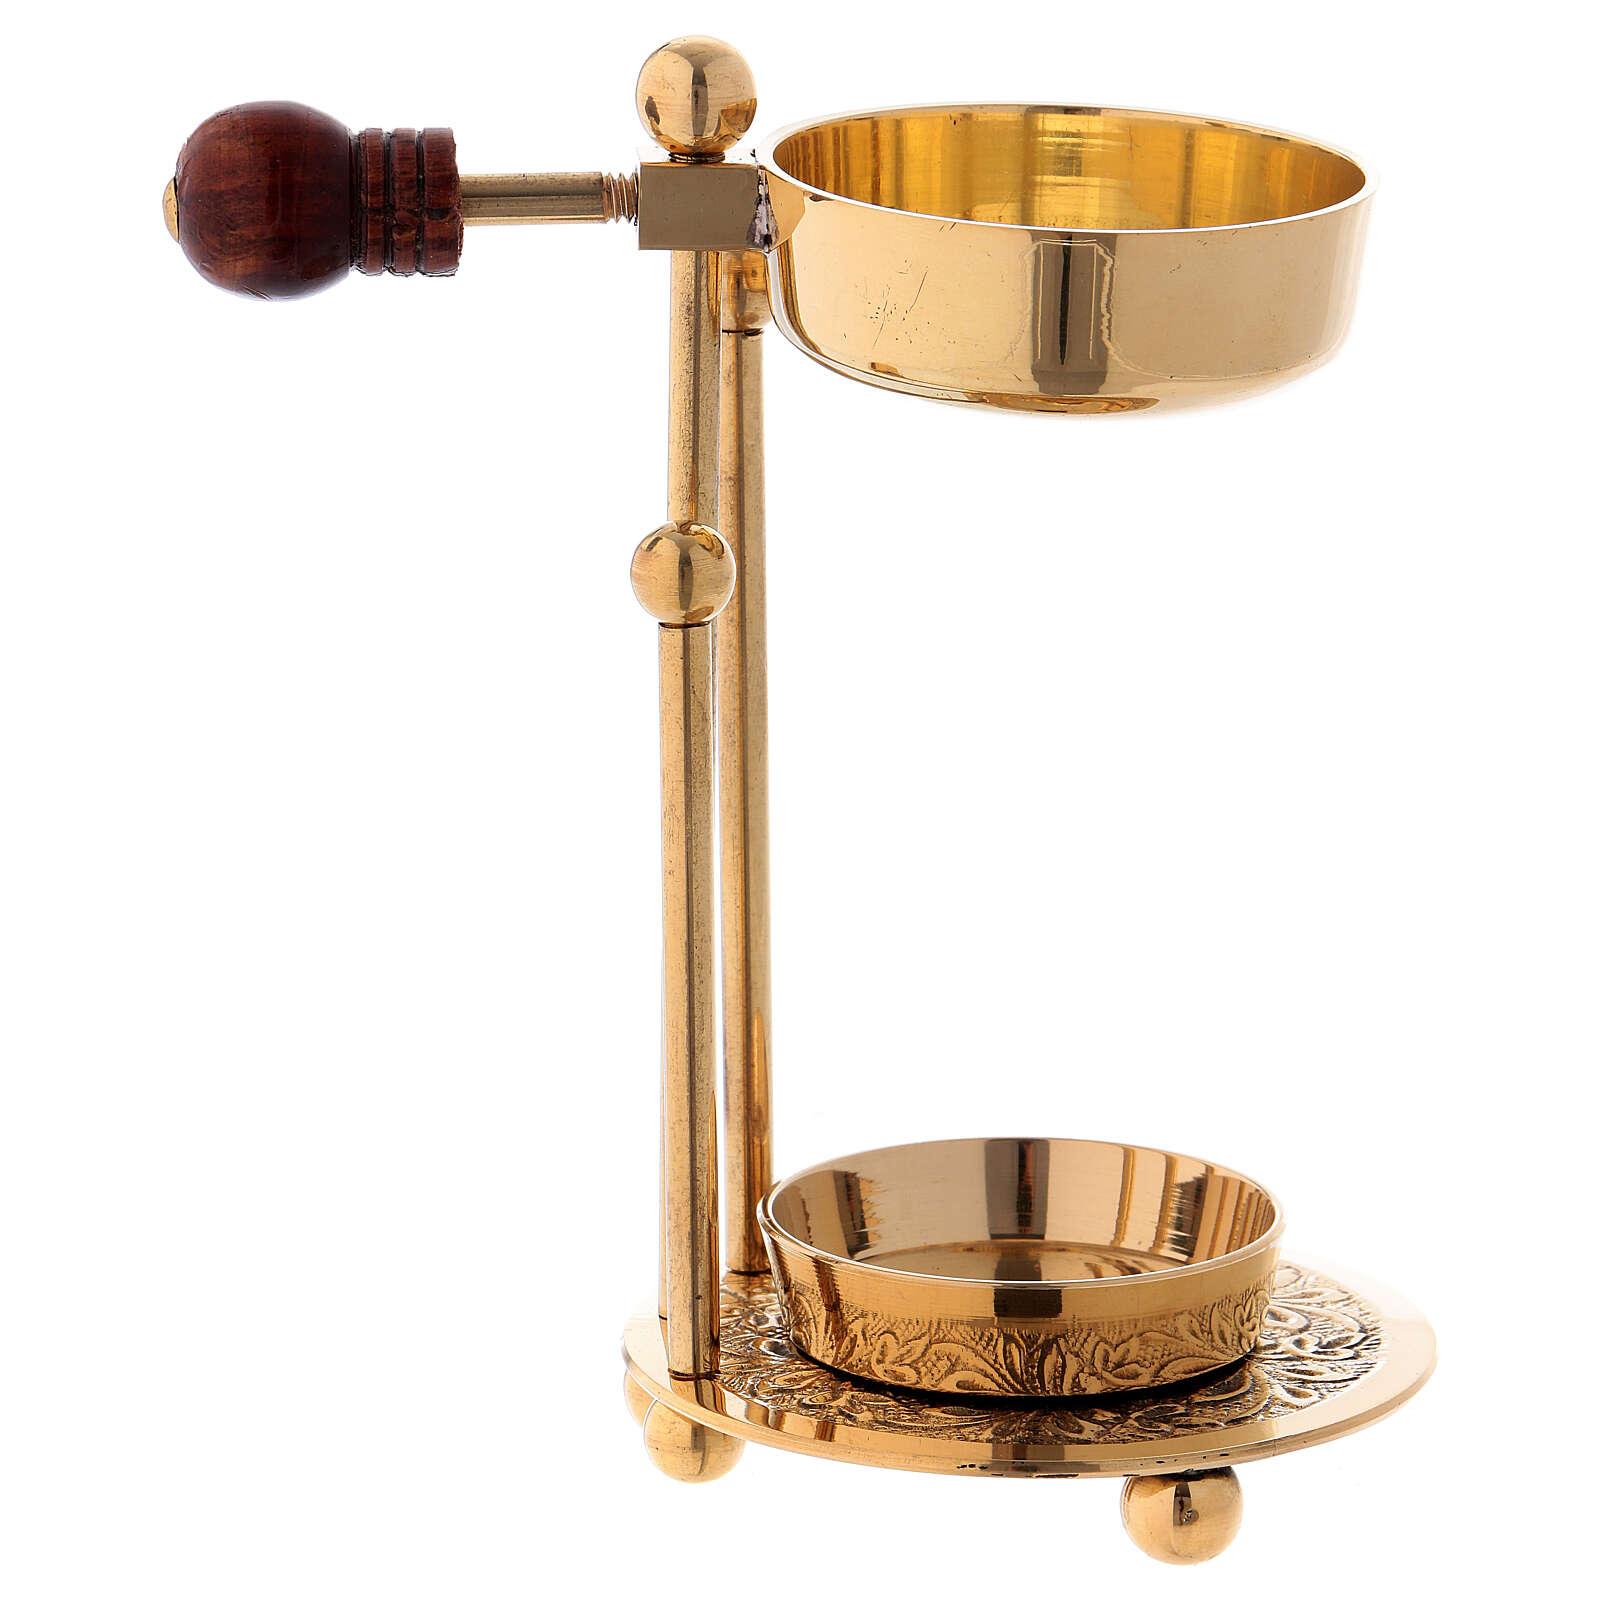 Gold plated polish brass incense burner three-feet base wood handle 4 1/4 in 3